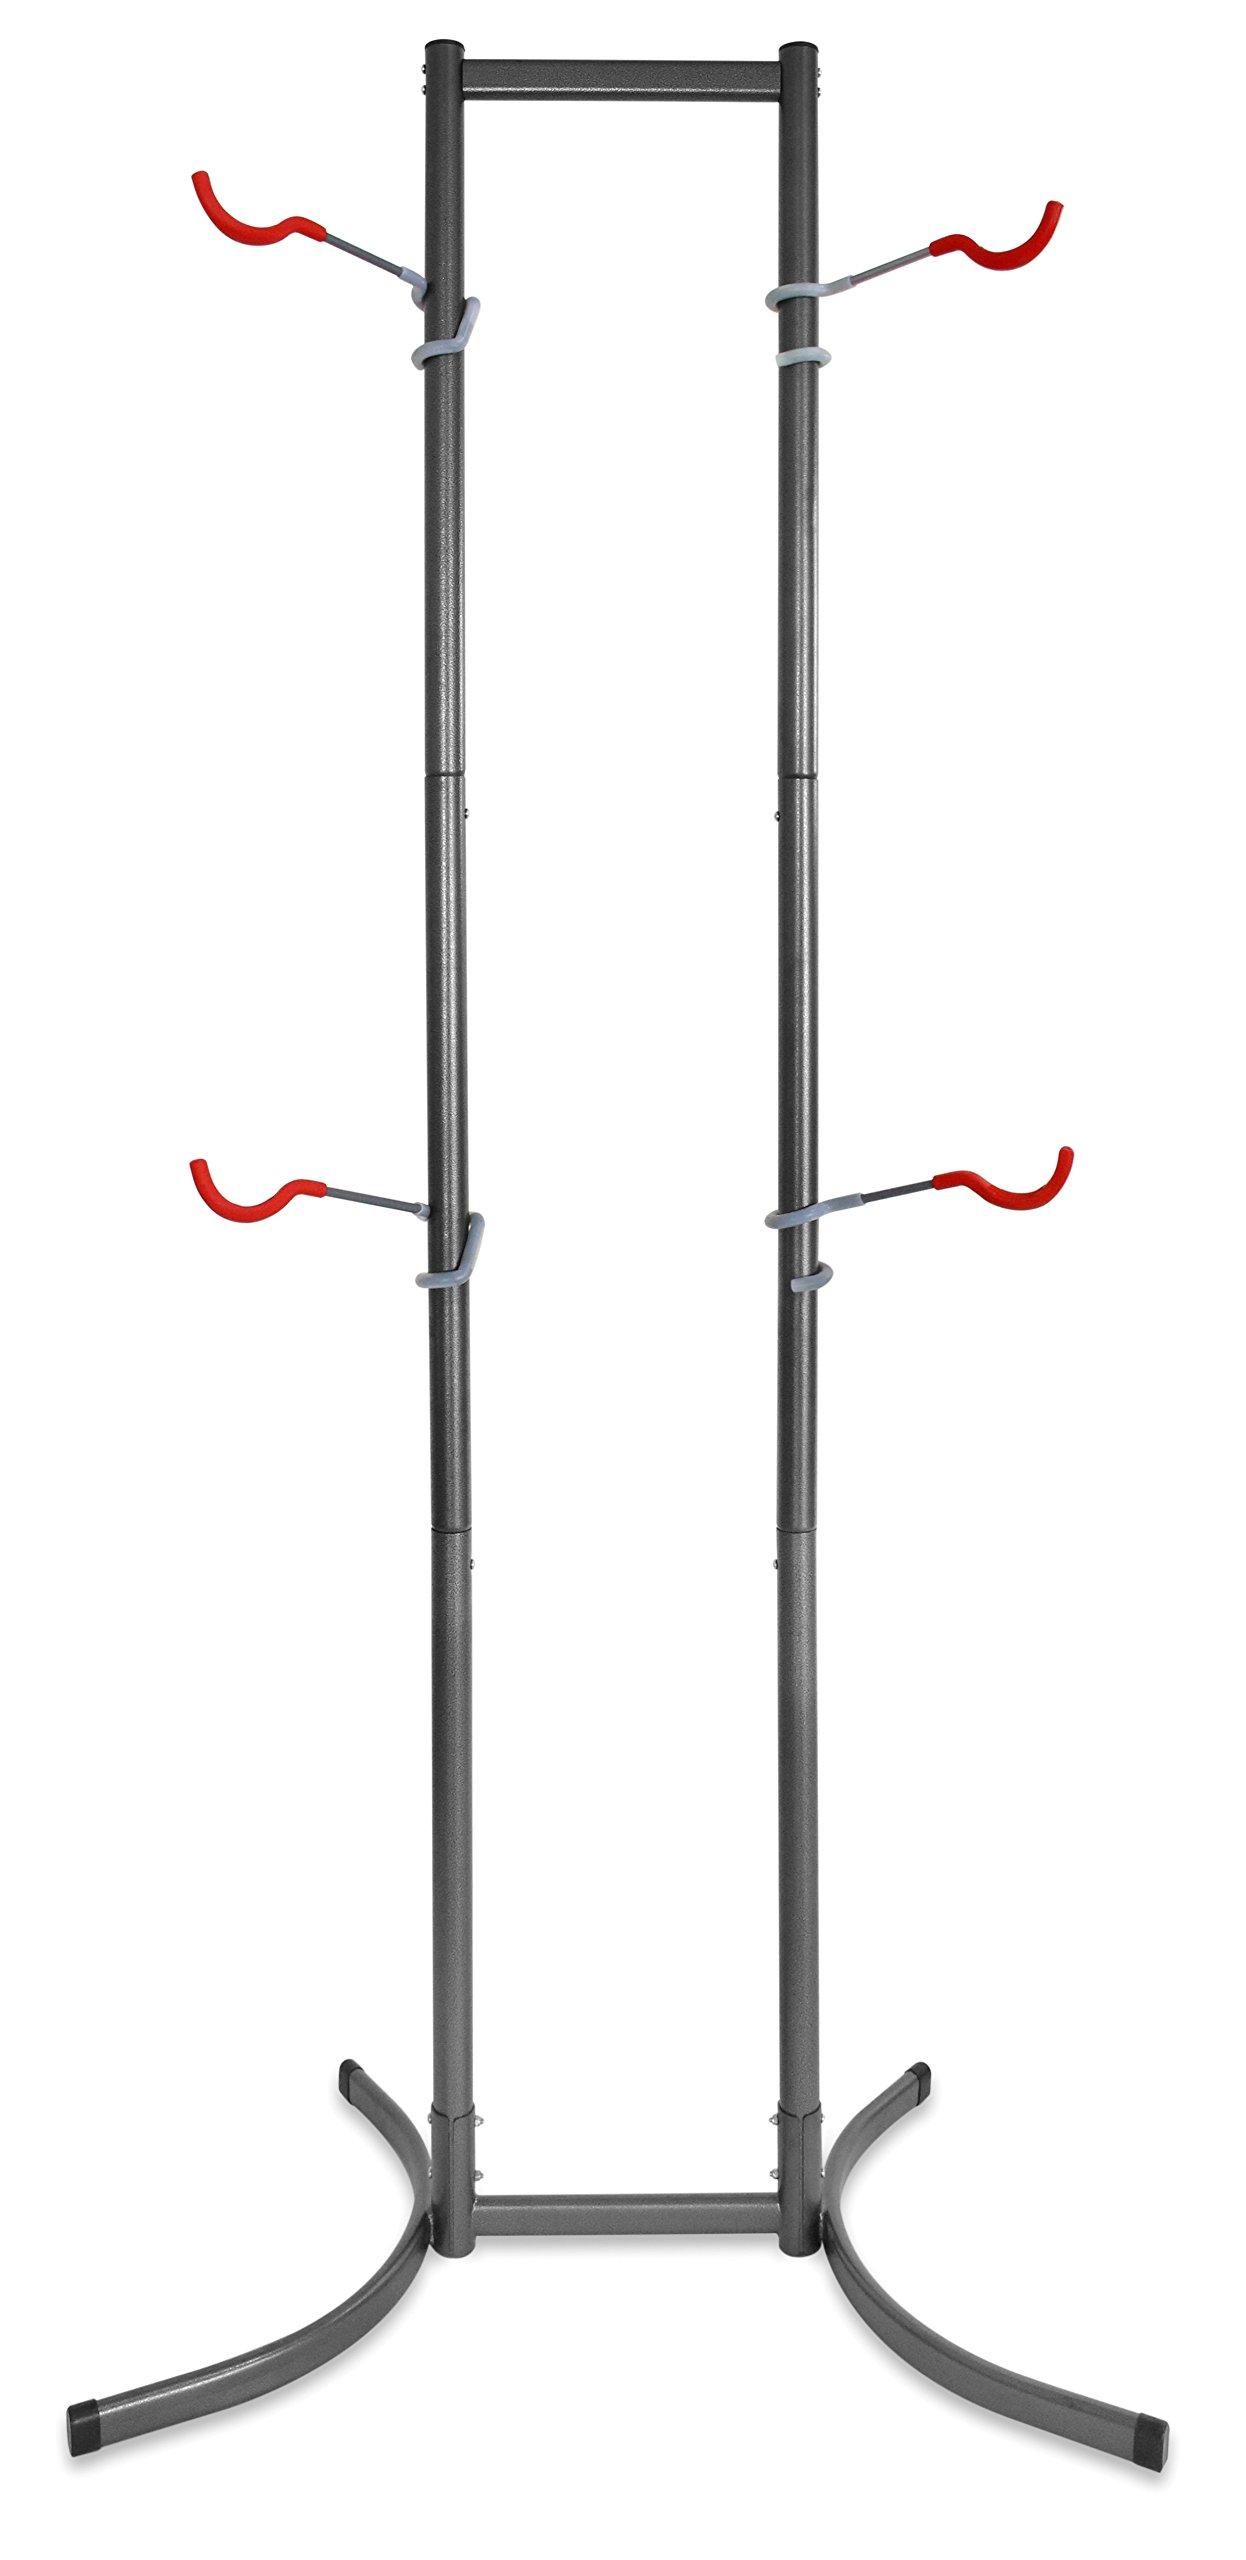 Delta Cycle Michelangelo Canaletto Two Four Bike Gravity Stand Garage Indoor Storage Adjustable